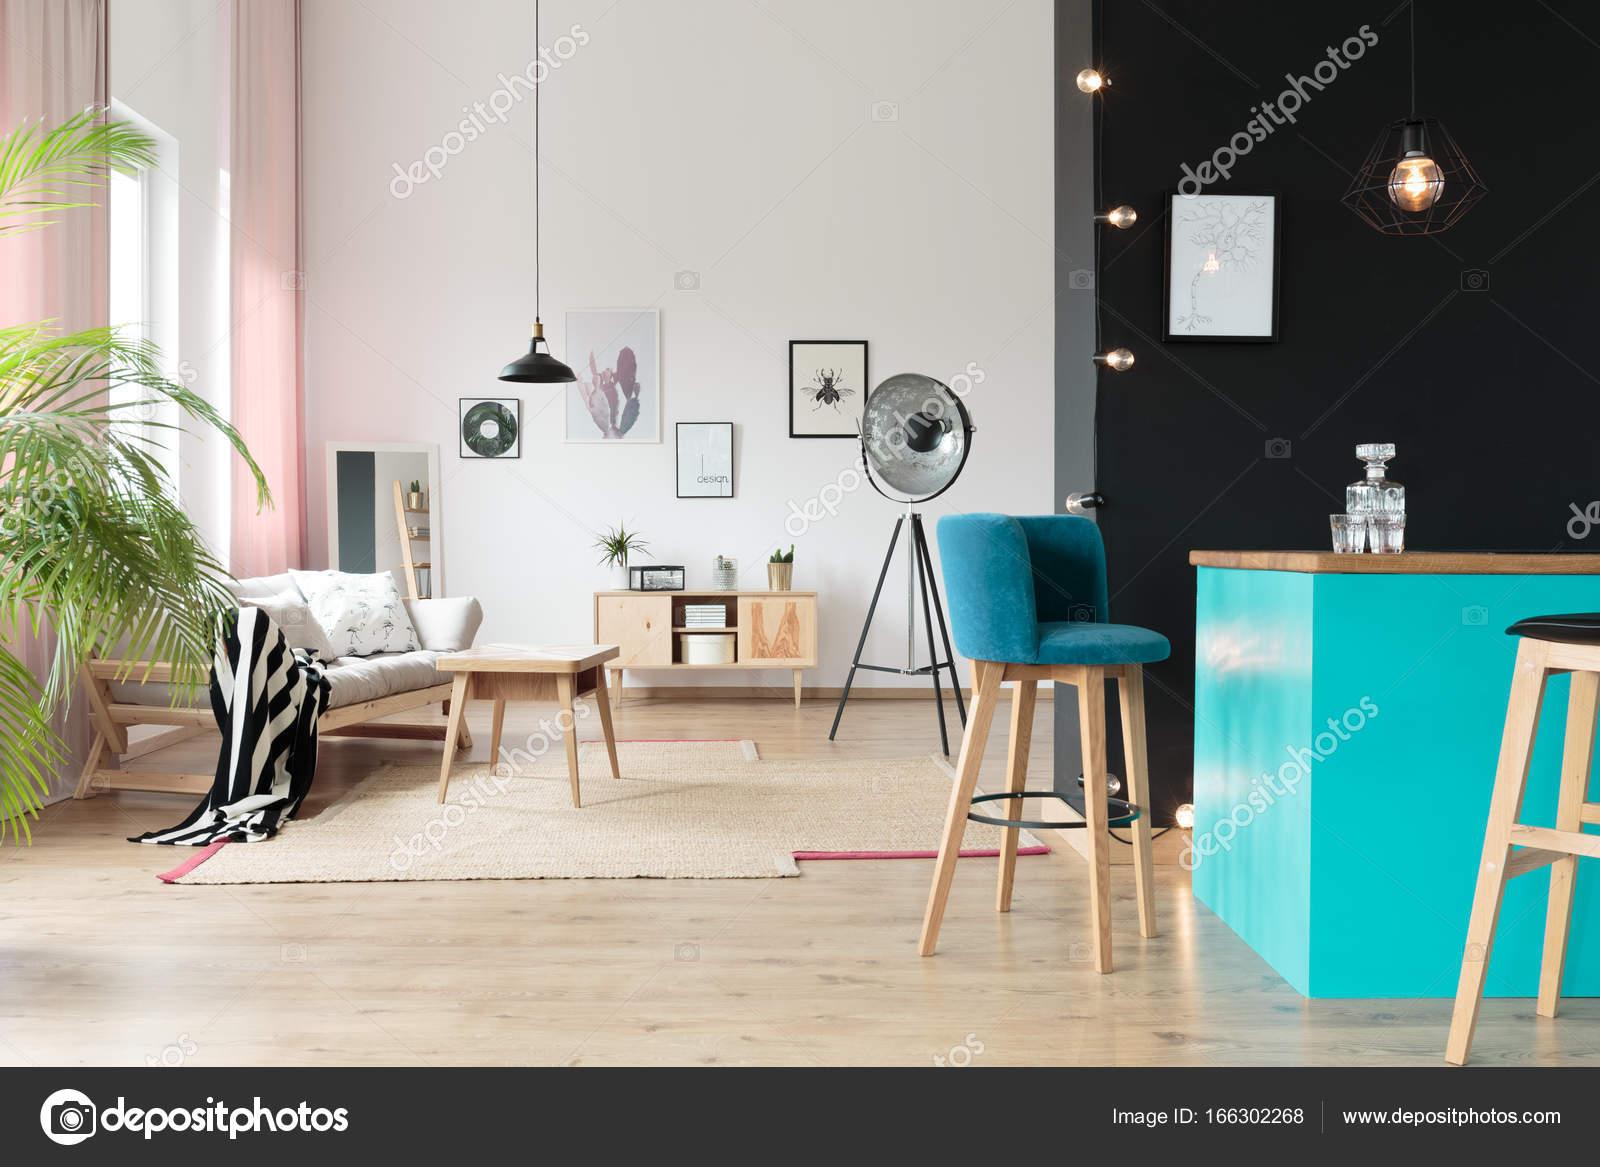 Offener Raum mit blauen minibar — Stockfoto © photographee.eu #166302268